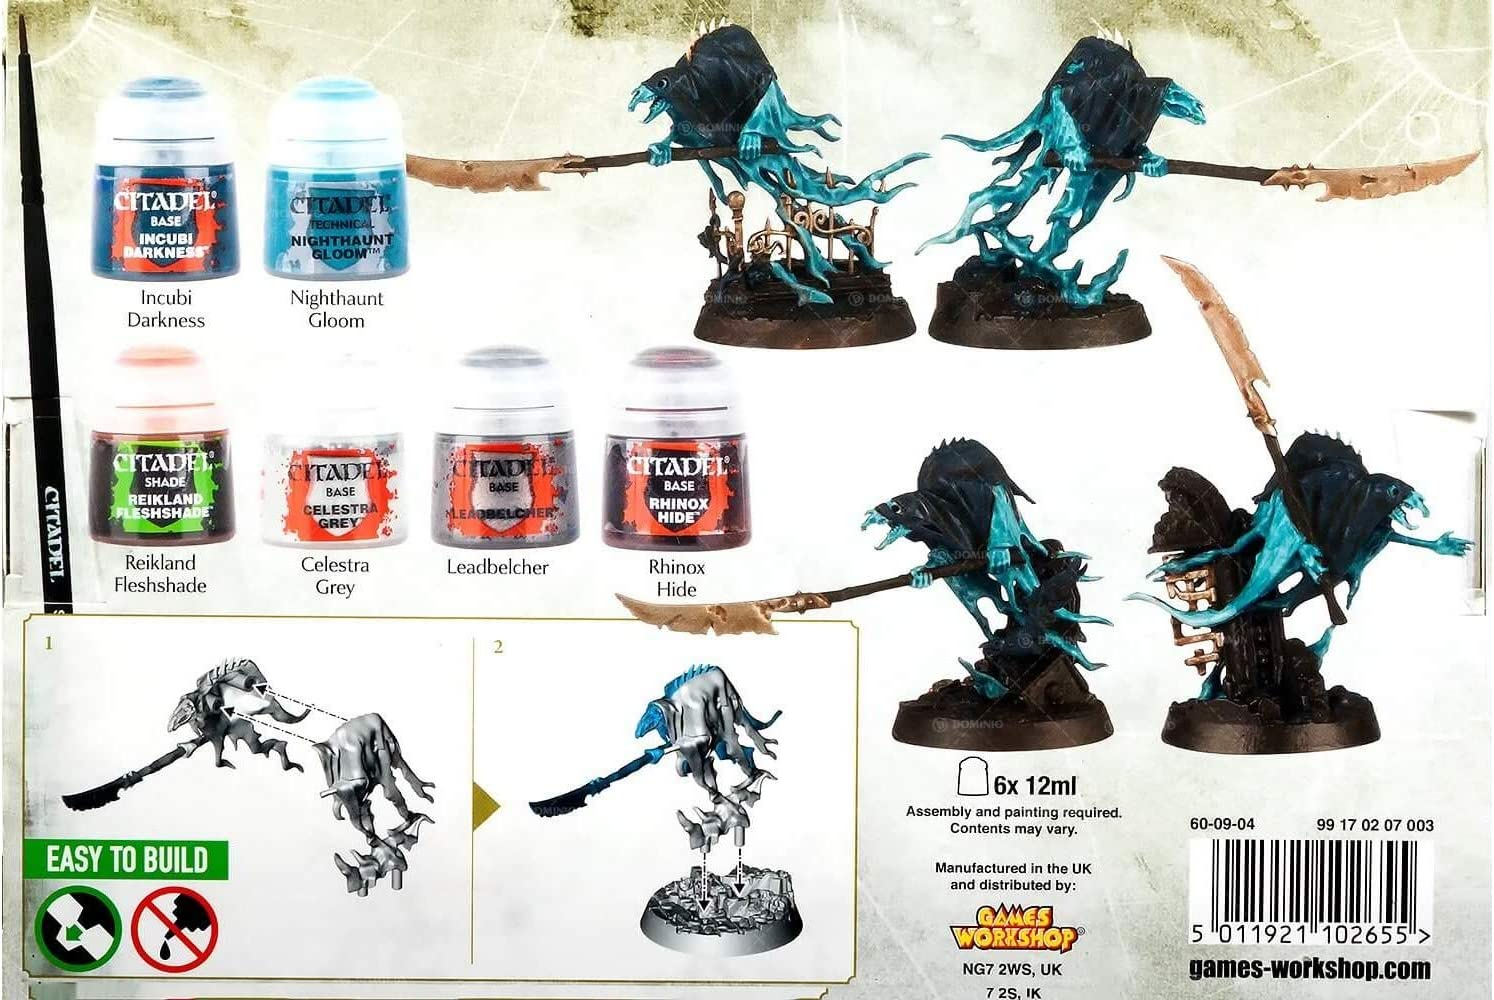 Warhammer Age of Sigmar Nighthaunt + Paint Set: Amazon.es: Juguetes y juegos